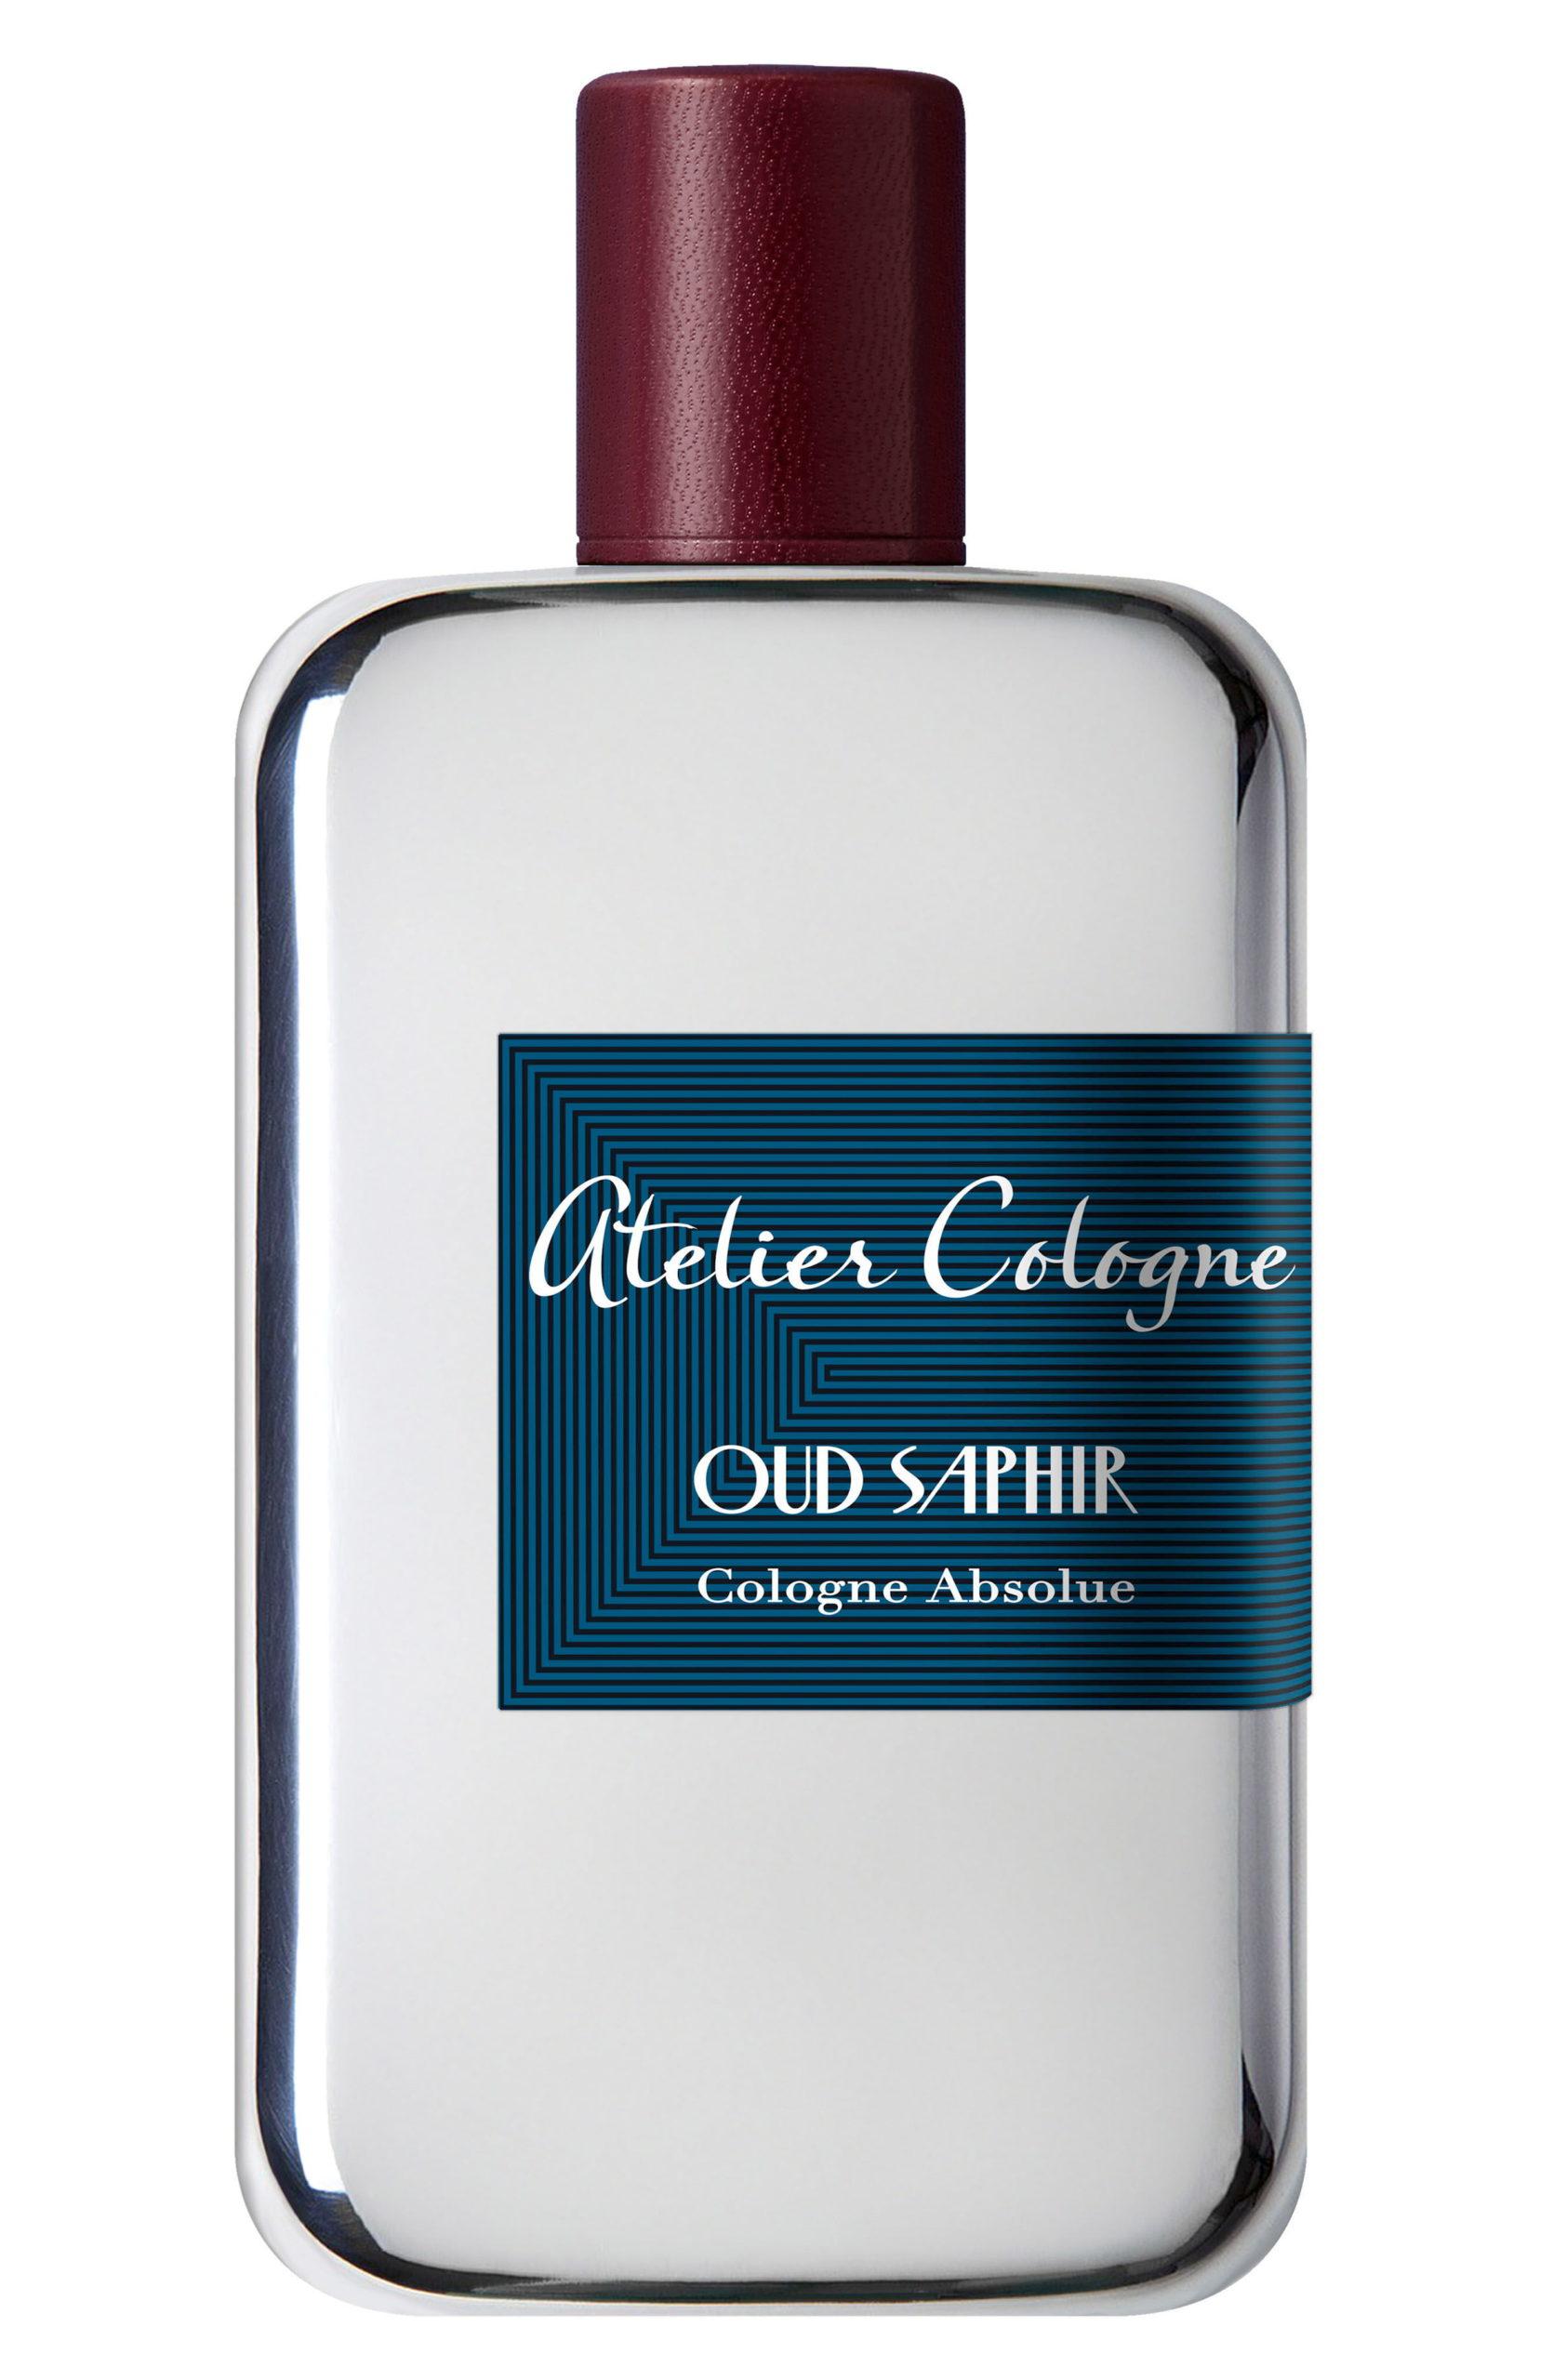 Oud Saphir Cologne Absolue Spray - 3.4oz